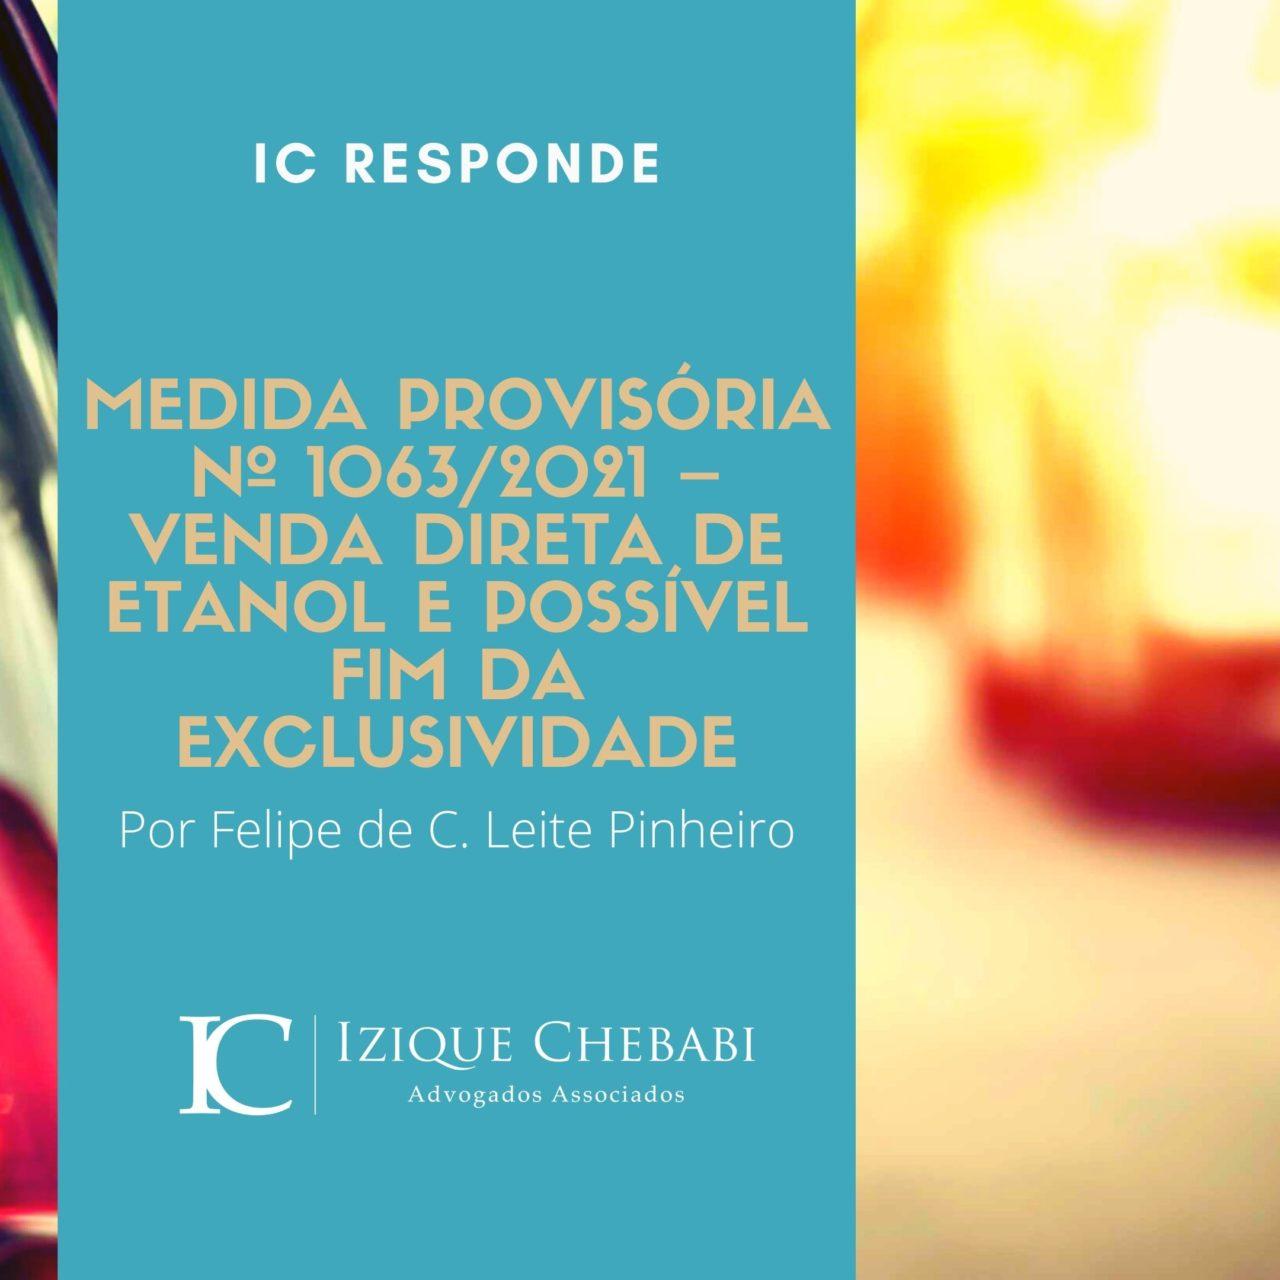 https://chebabi.com/wp-content/uploads/2021/08/Copia-de-Turquesa-Viagem-Instagram-Post-7-1280x1280.jpg